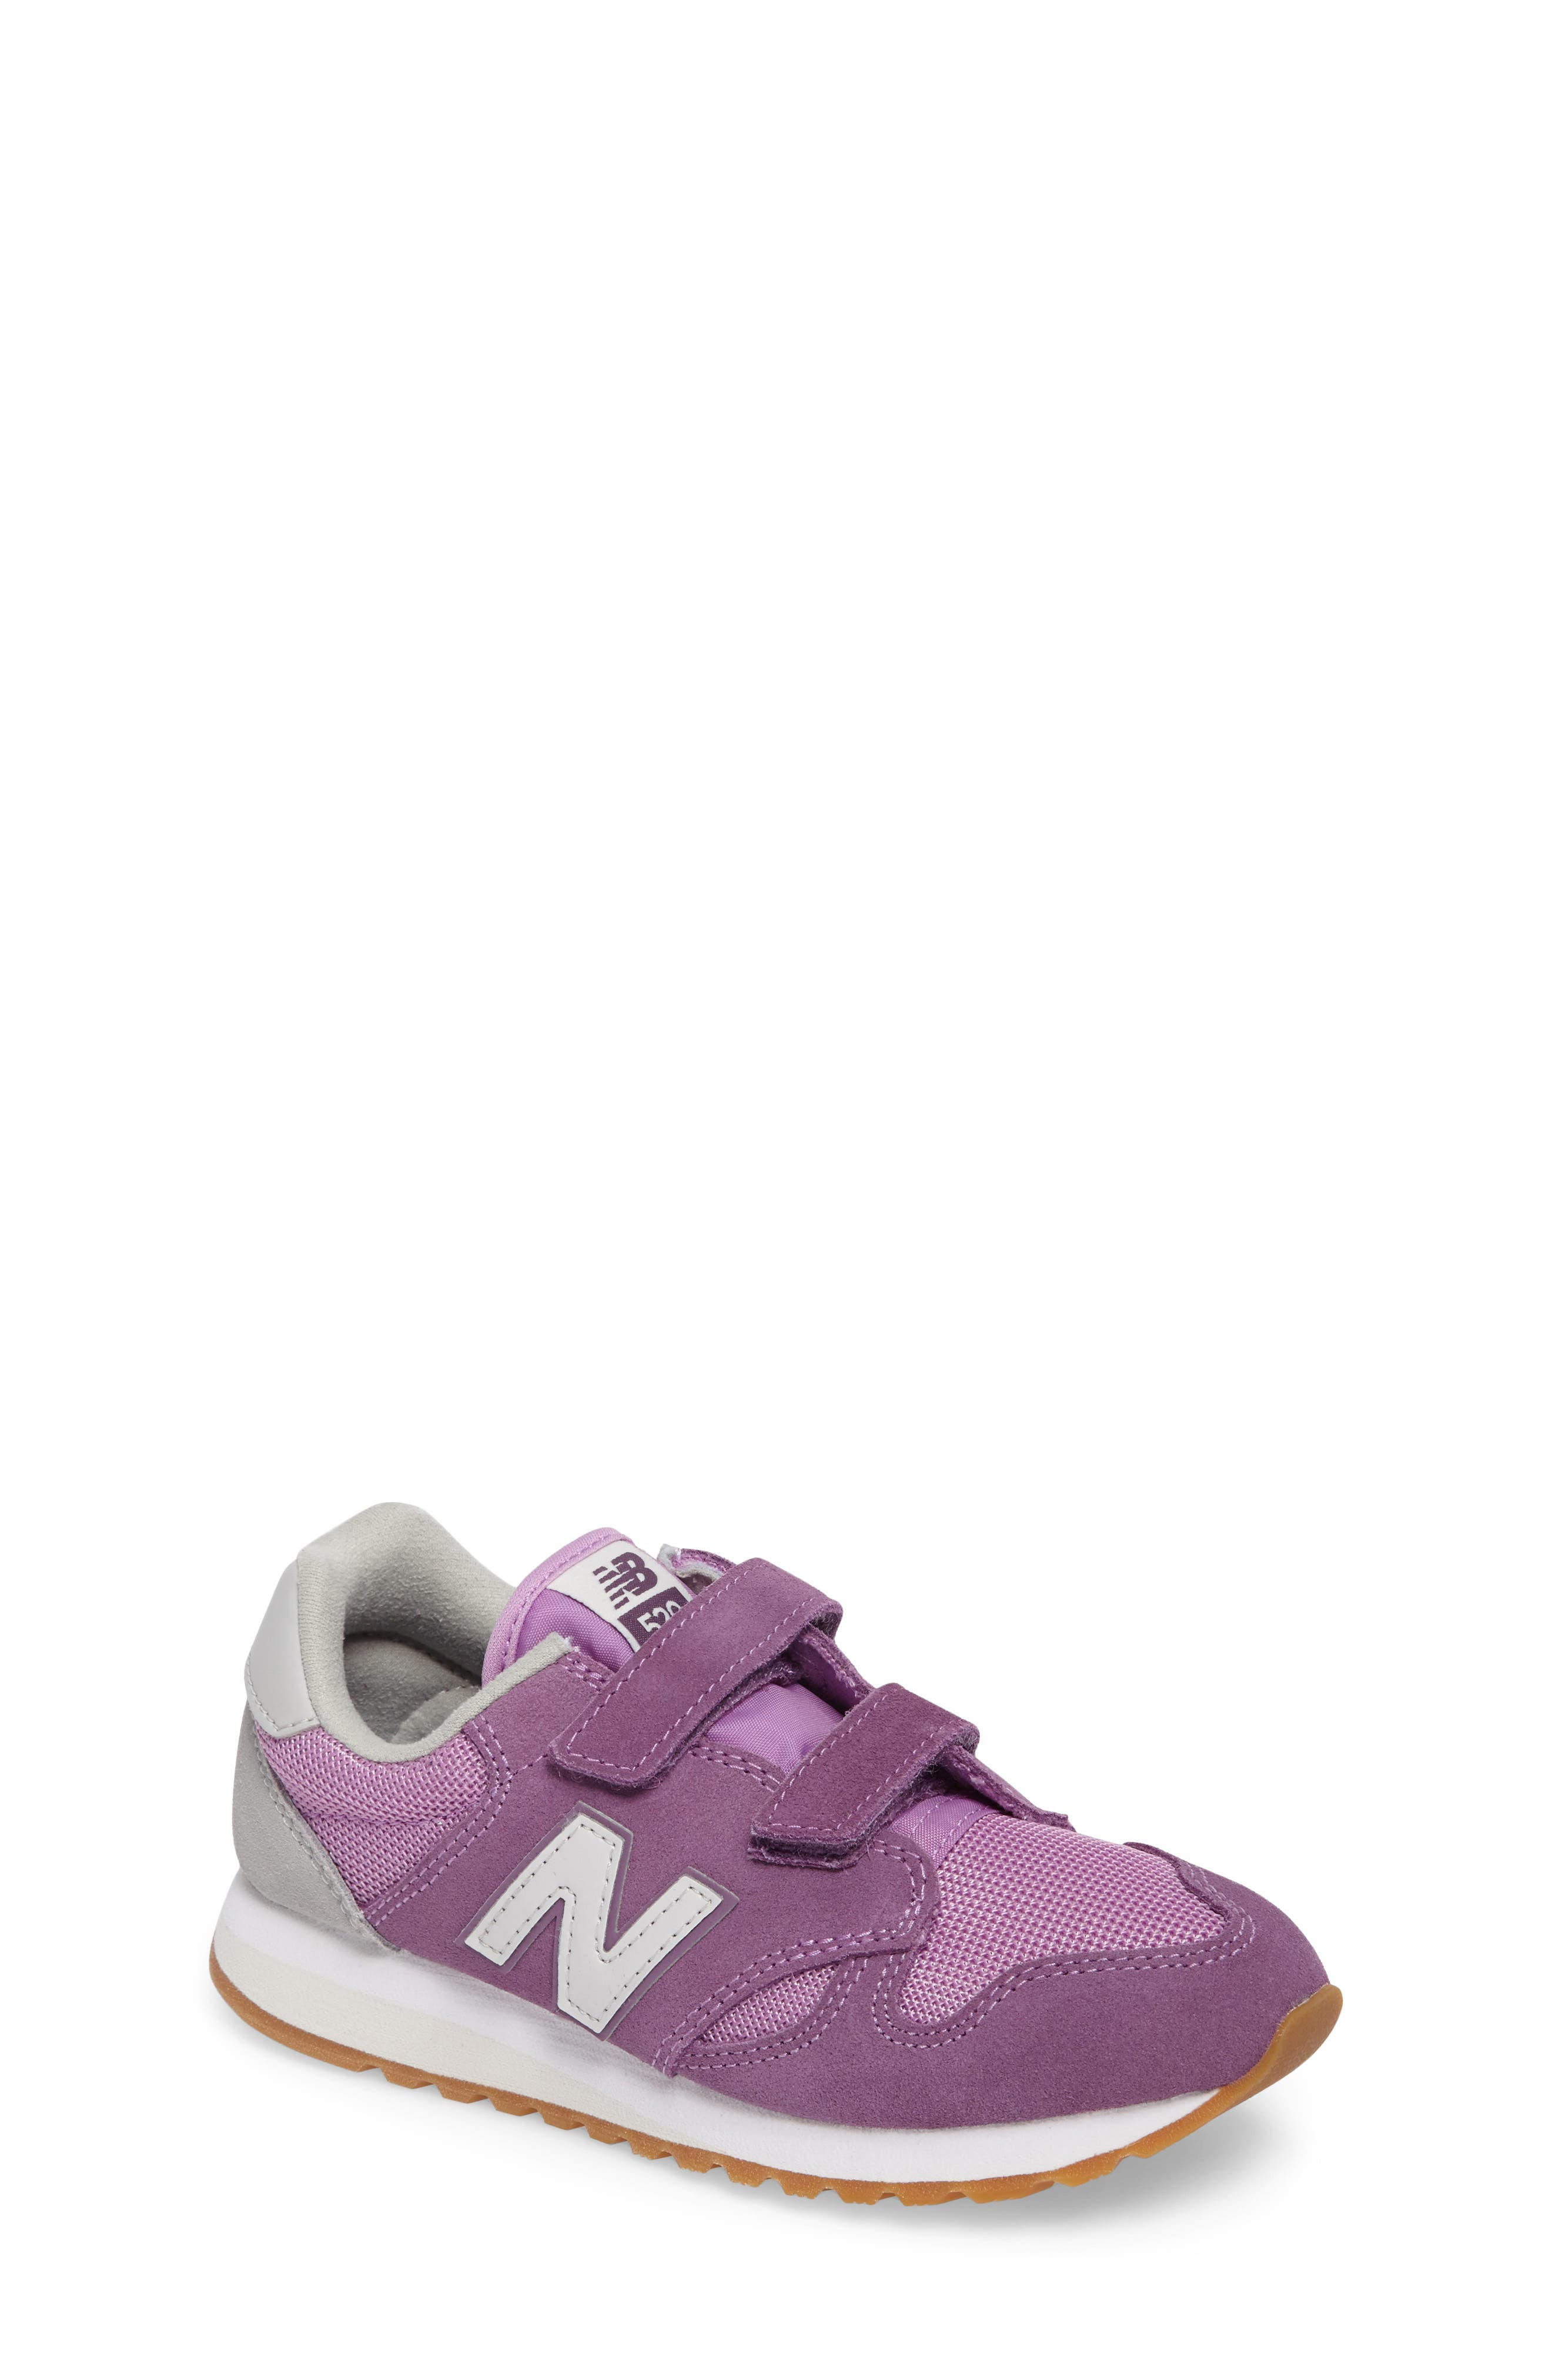 NEW BALANCE 520 Sneaker